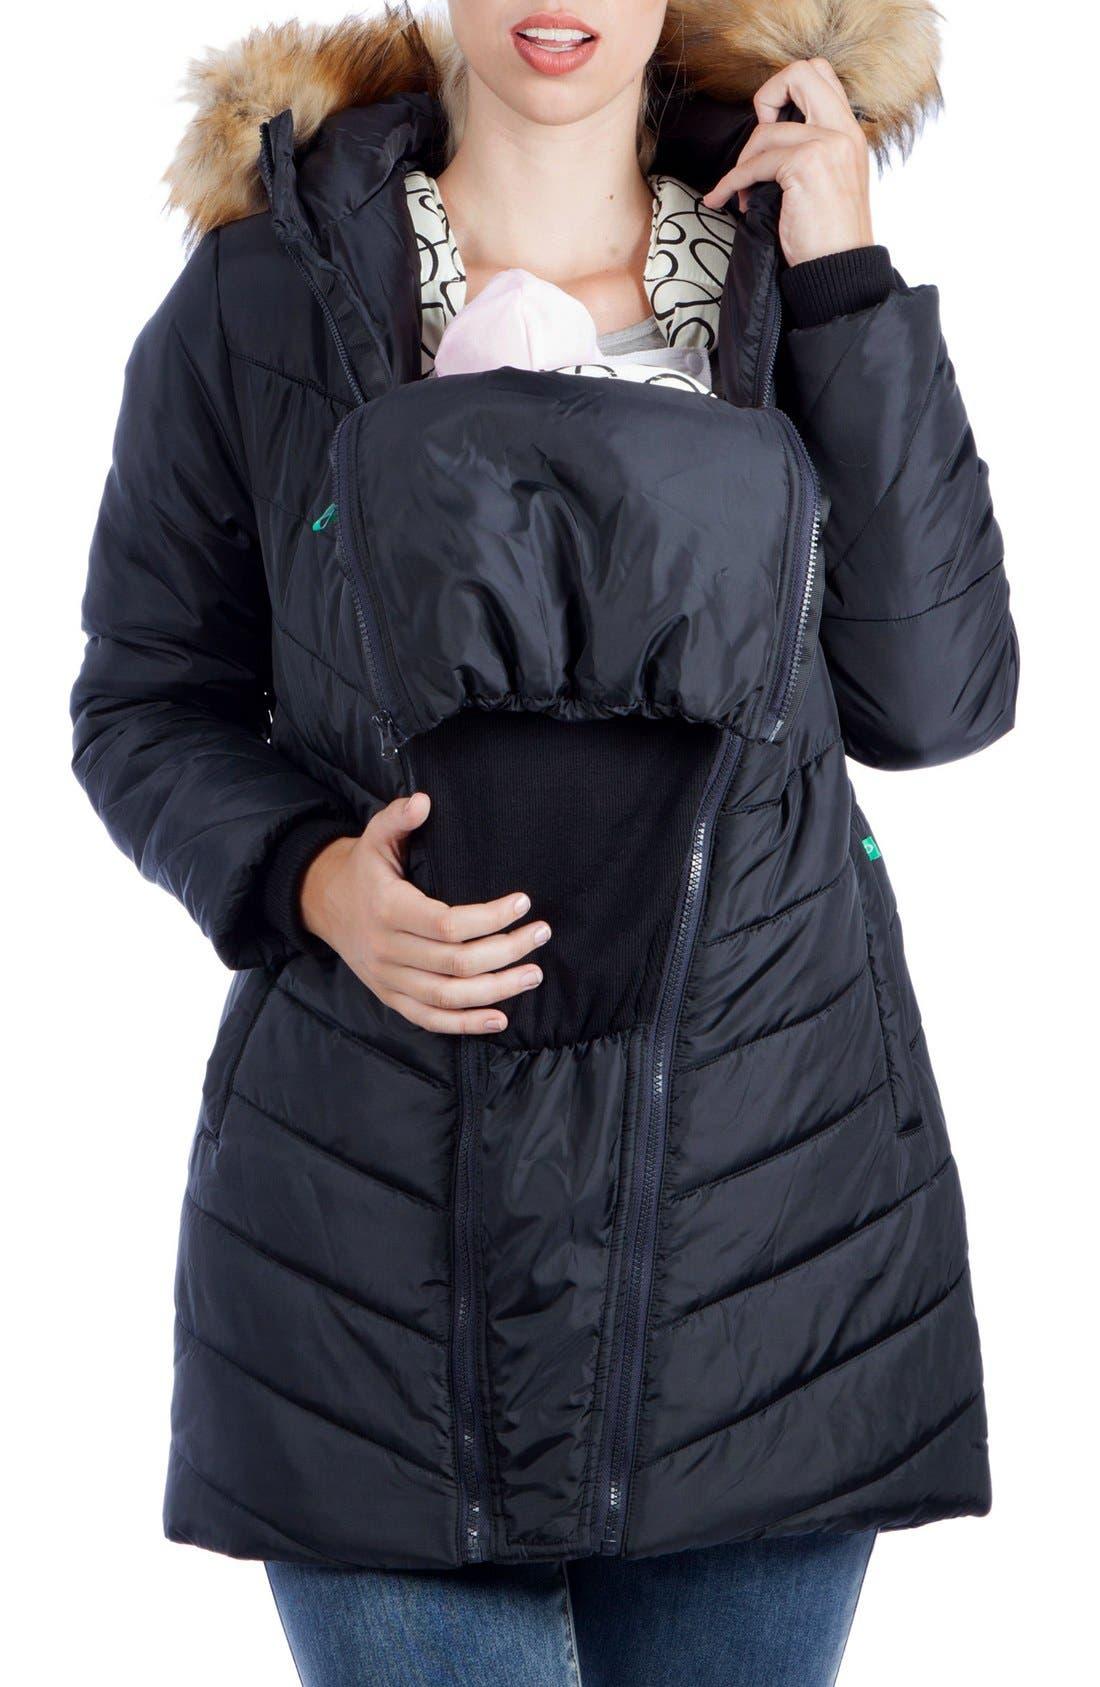 MODERN ETERNITY, Faux Fur Trim Convertible Puffer 3-in-1 Maternity Jacket, Alternate thumbnail 9, color, BLACK